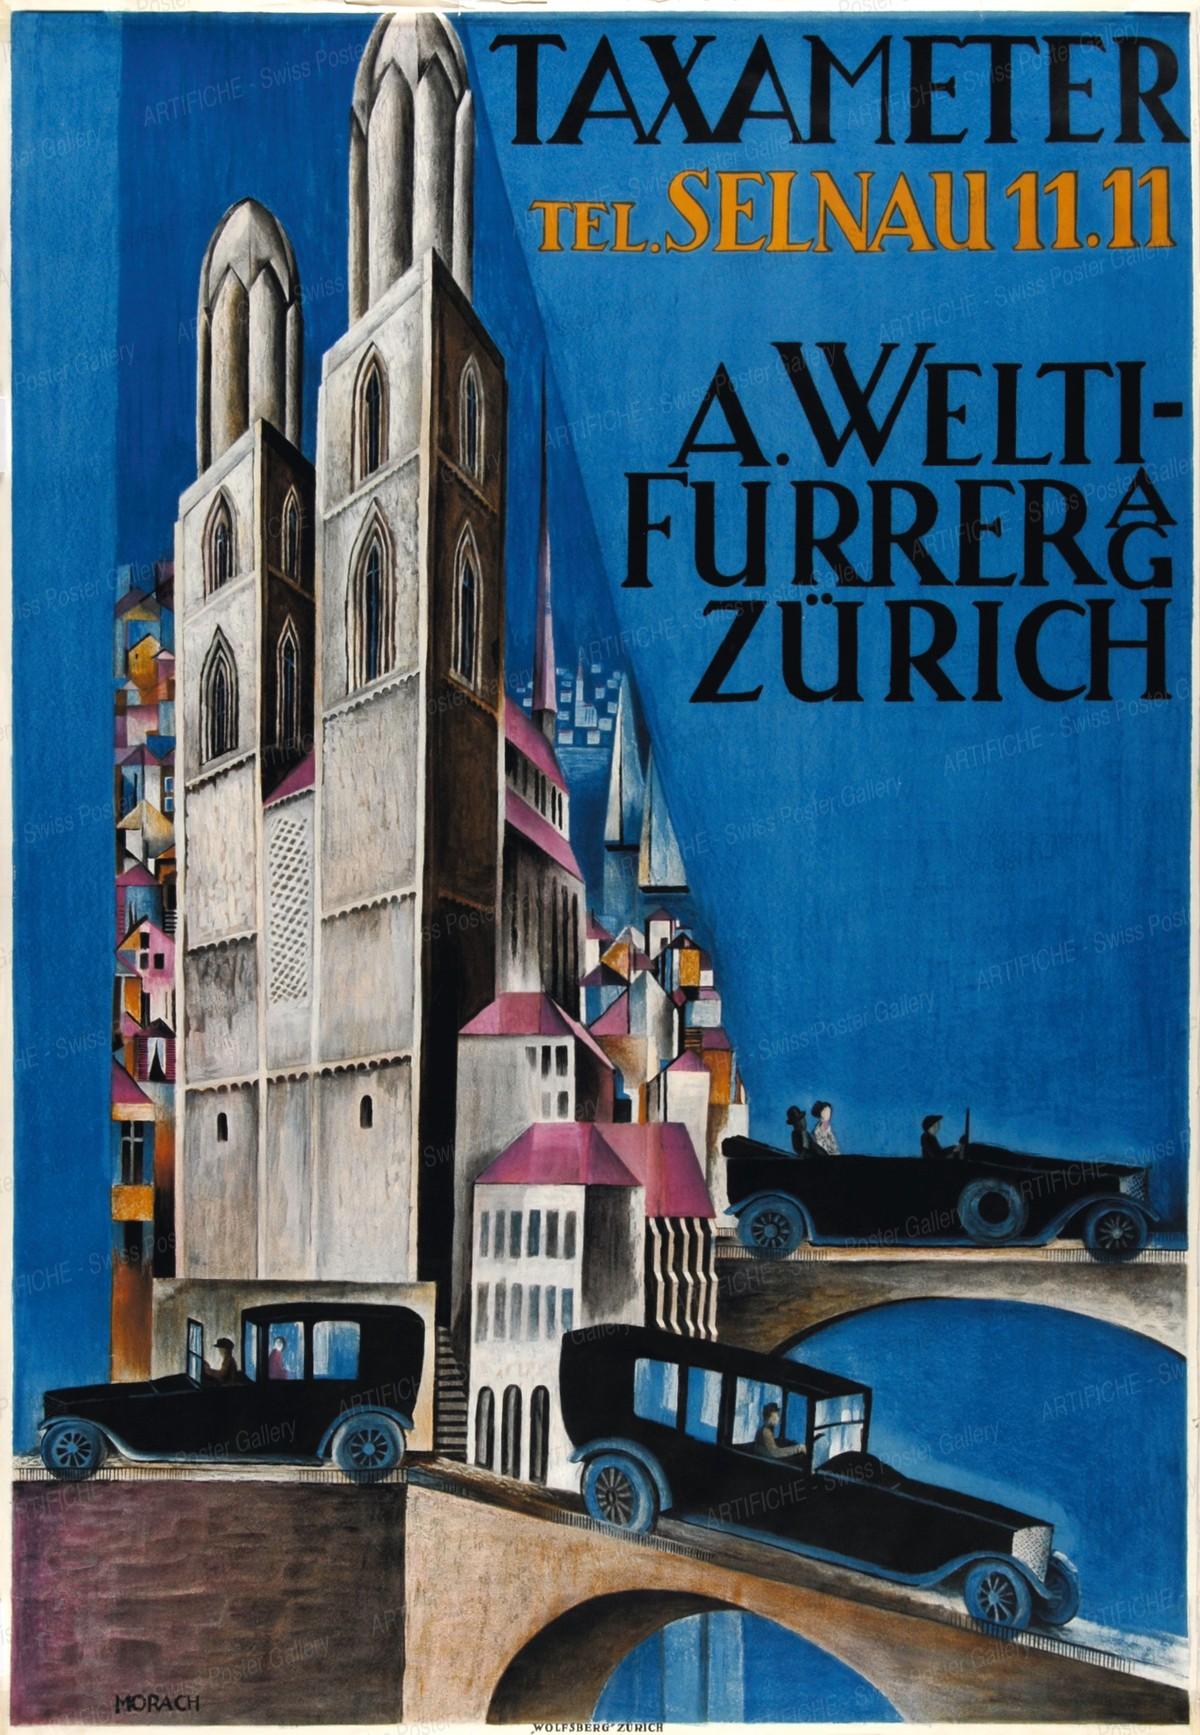 TAXAMETER – TEL. SELNAU 11.11 – A. Welti-Furrer AG Zürich, Otto Morach